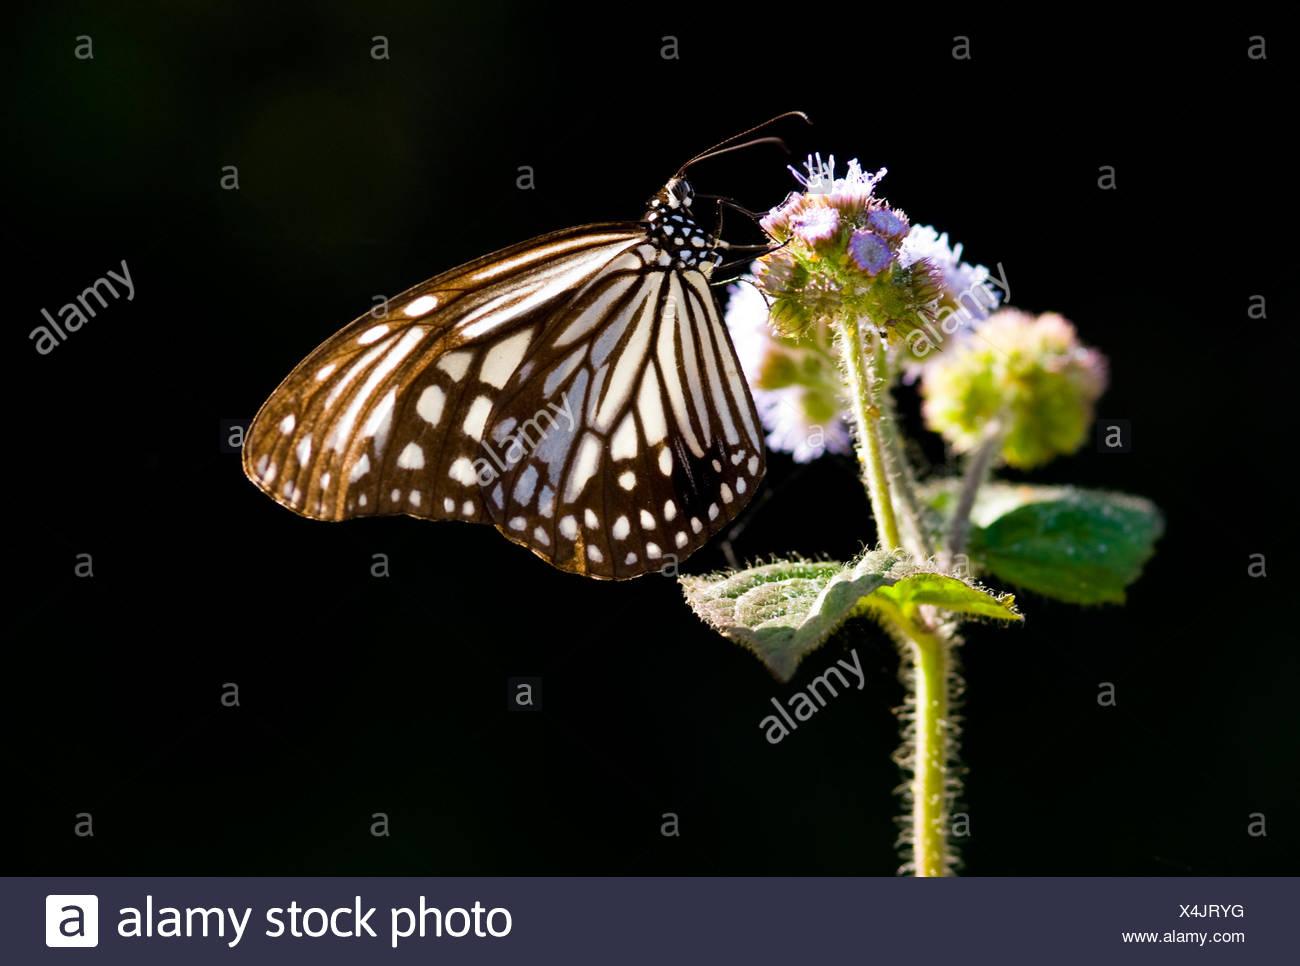 Milkweed farfalle e fiori viola. Milkweed butterfly (Parantica aglea maghaba). Immagini Stock